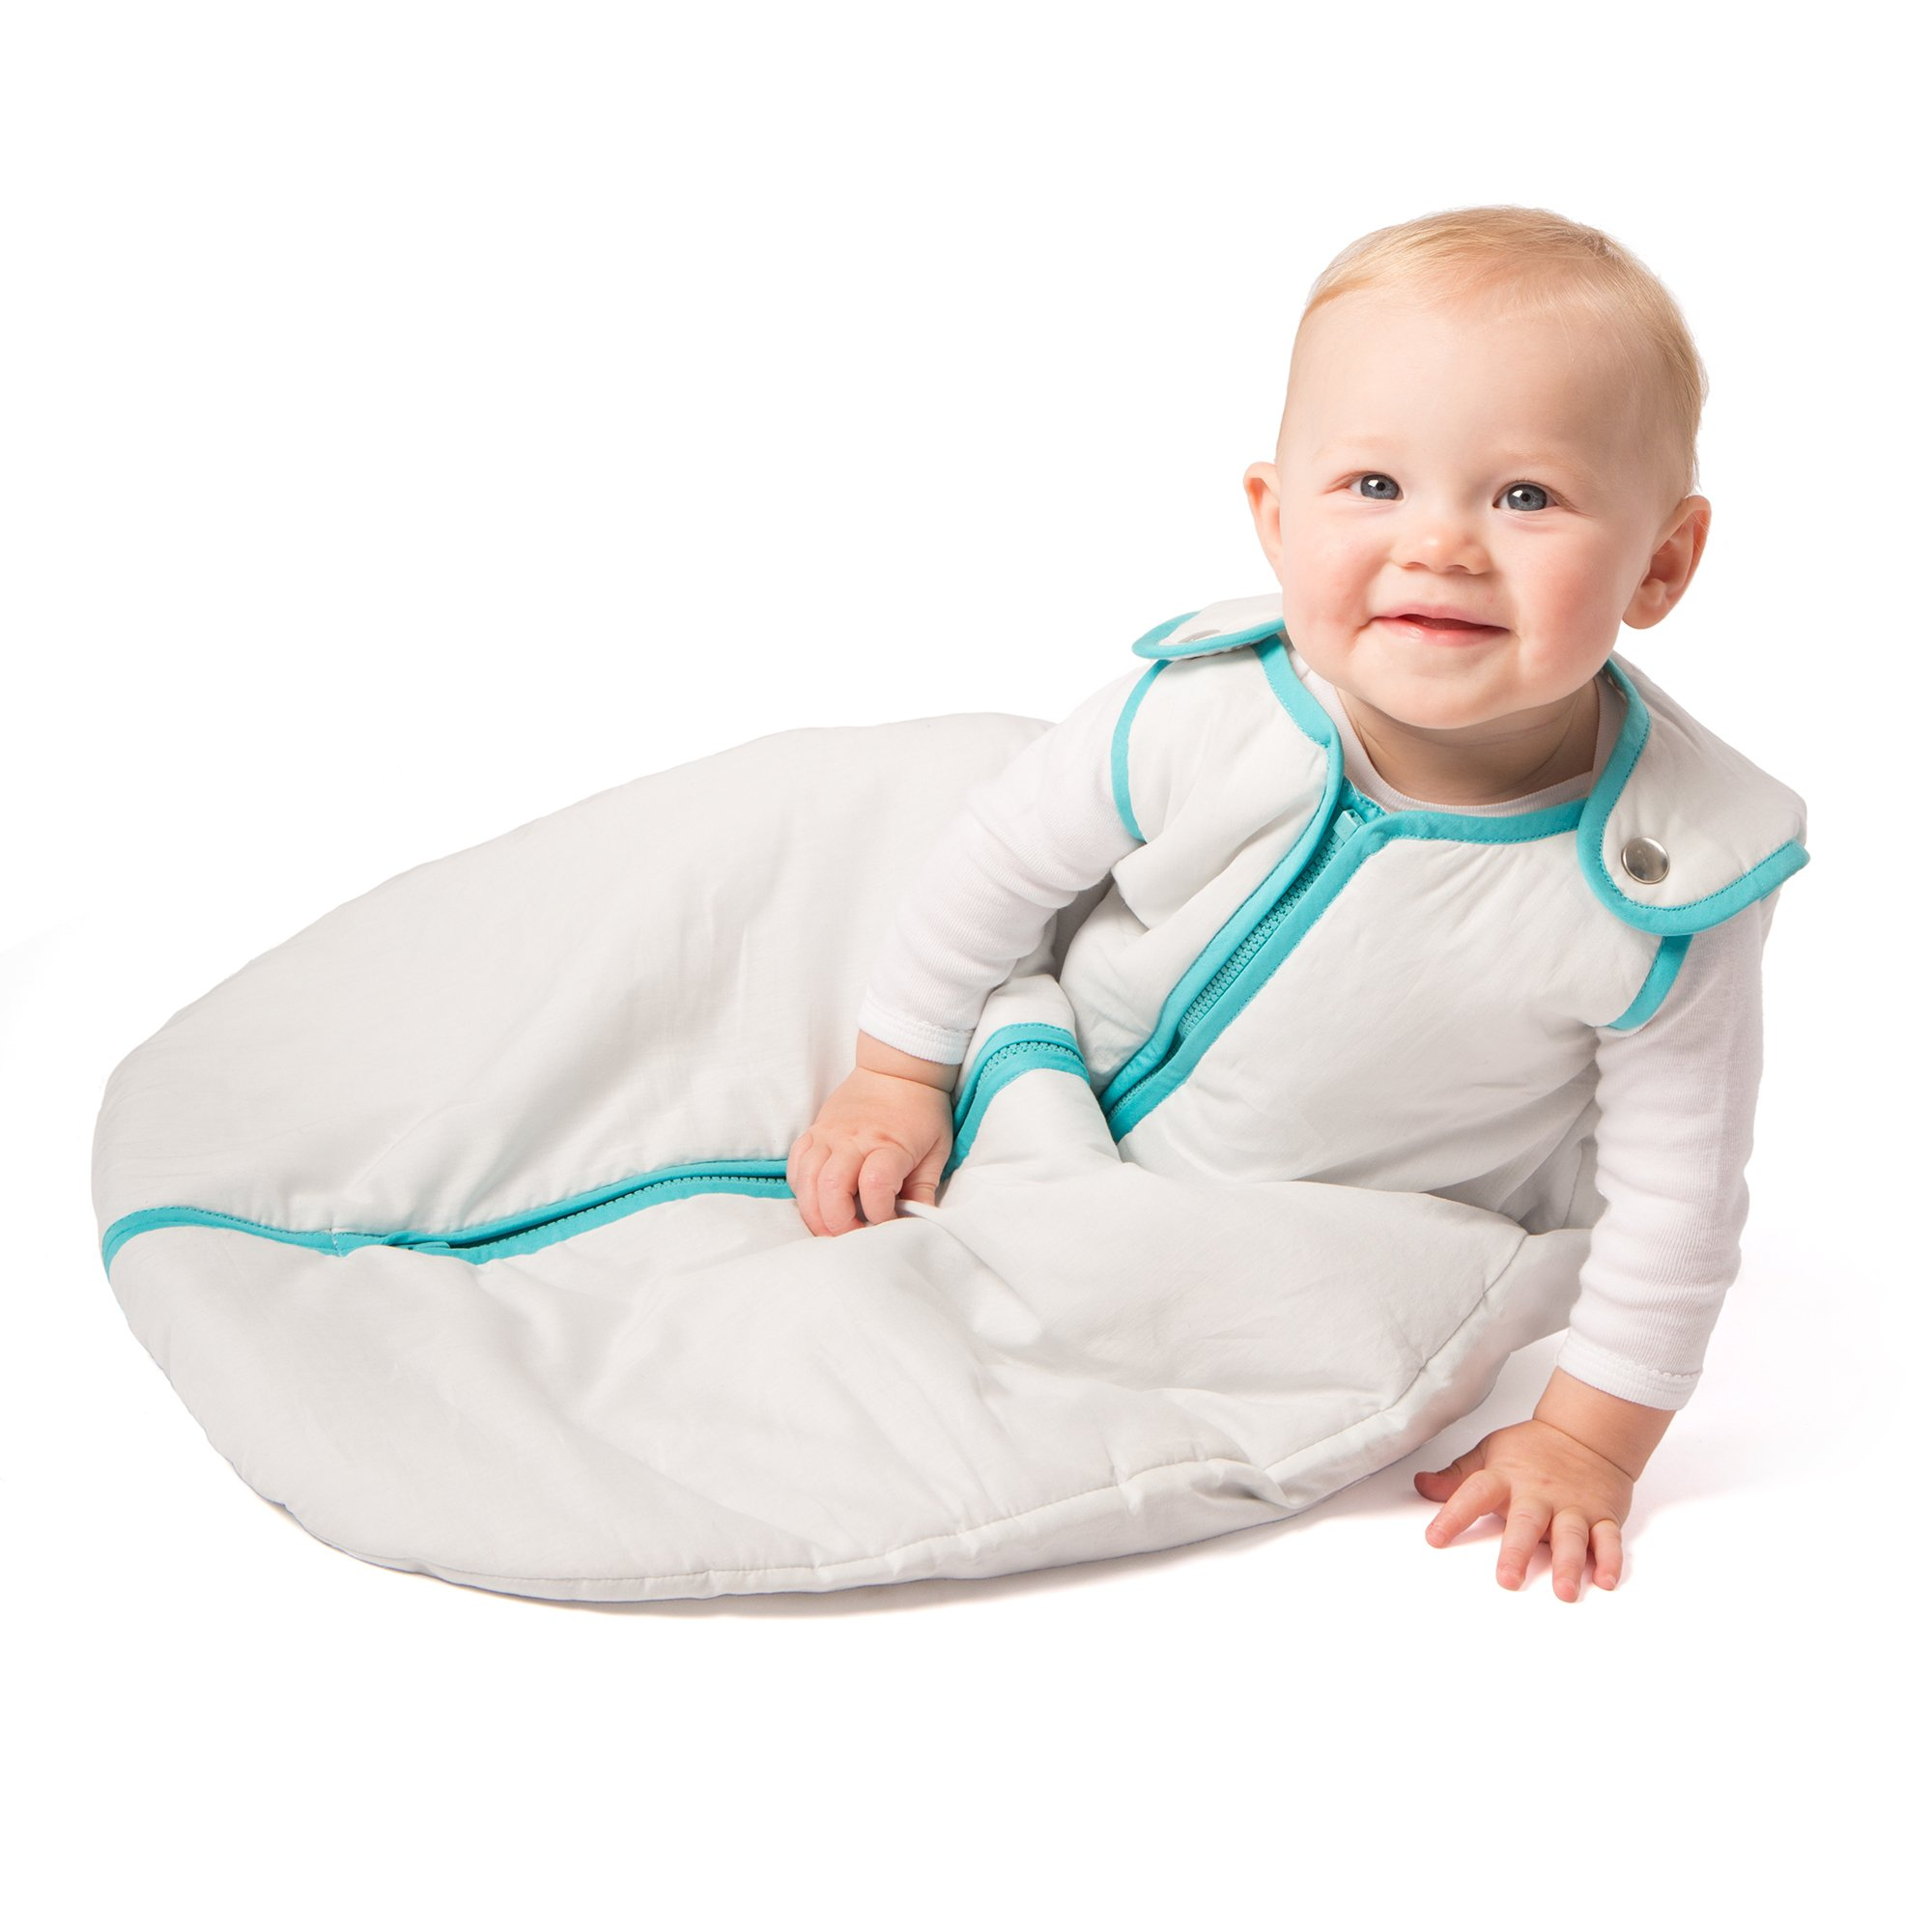 Baby Deedee Sleep Nest Sleeping Sack, Warm Baby Sleeping Bag fits Newborns and Infants,Large (18-36 Months) by baby deedee